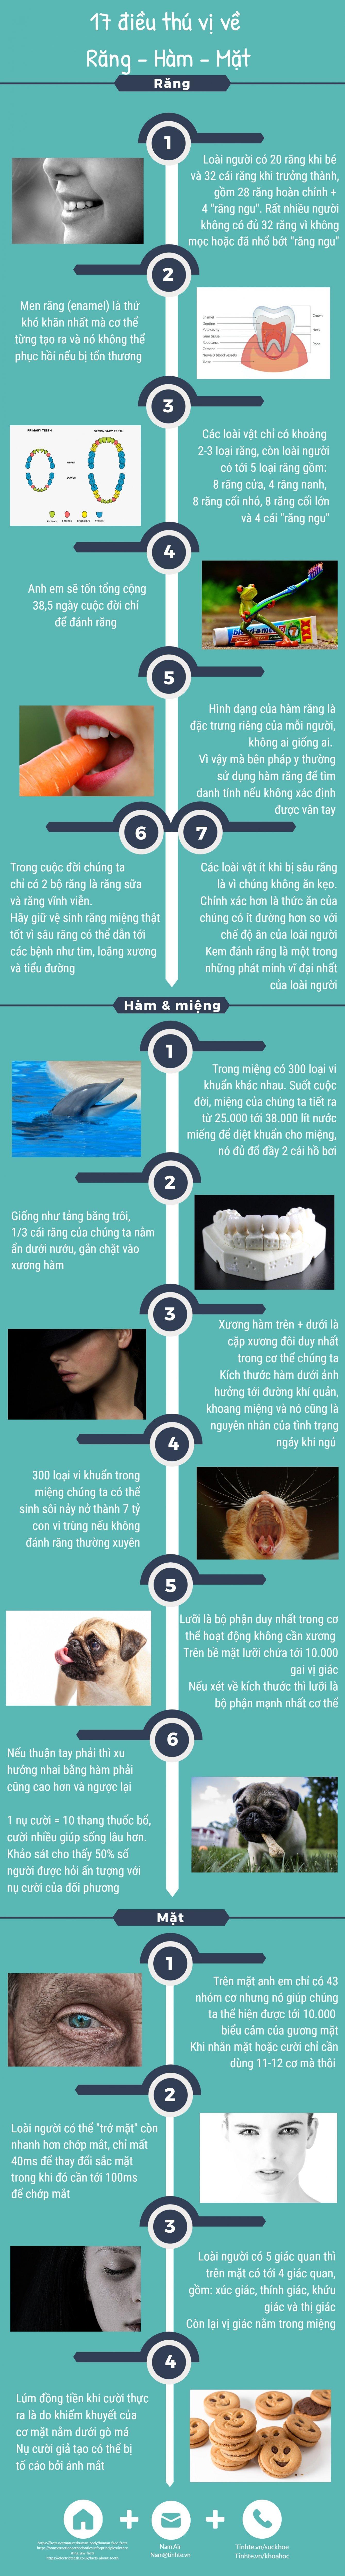 Tinhte_infographic_rang-ham-mat.jpg